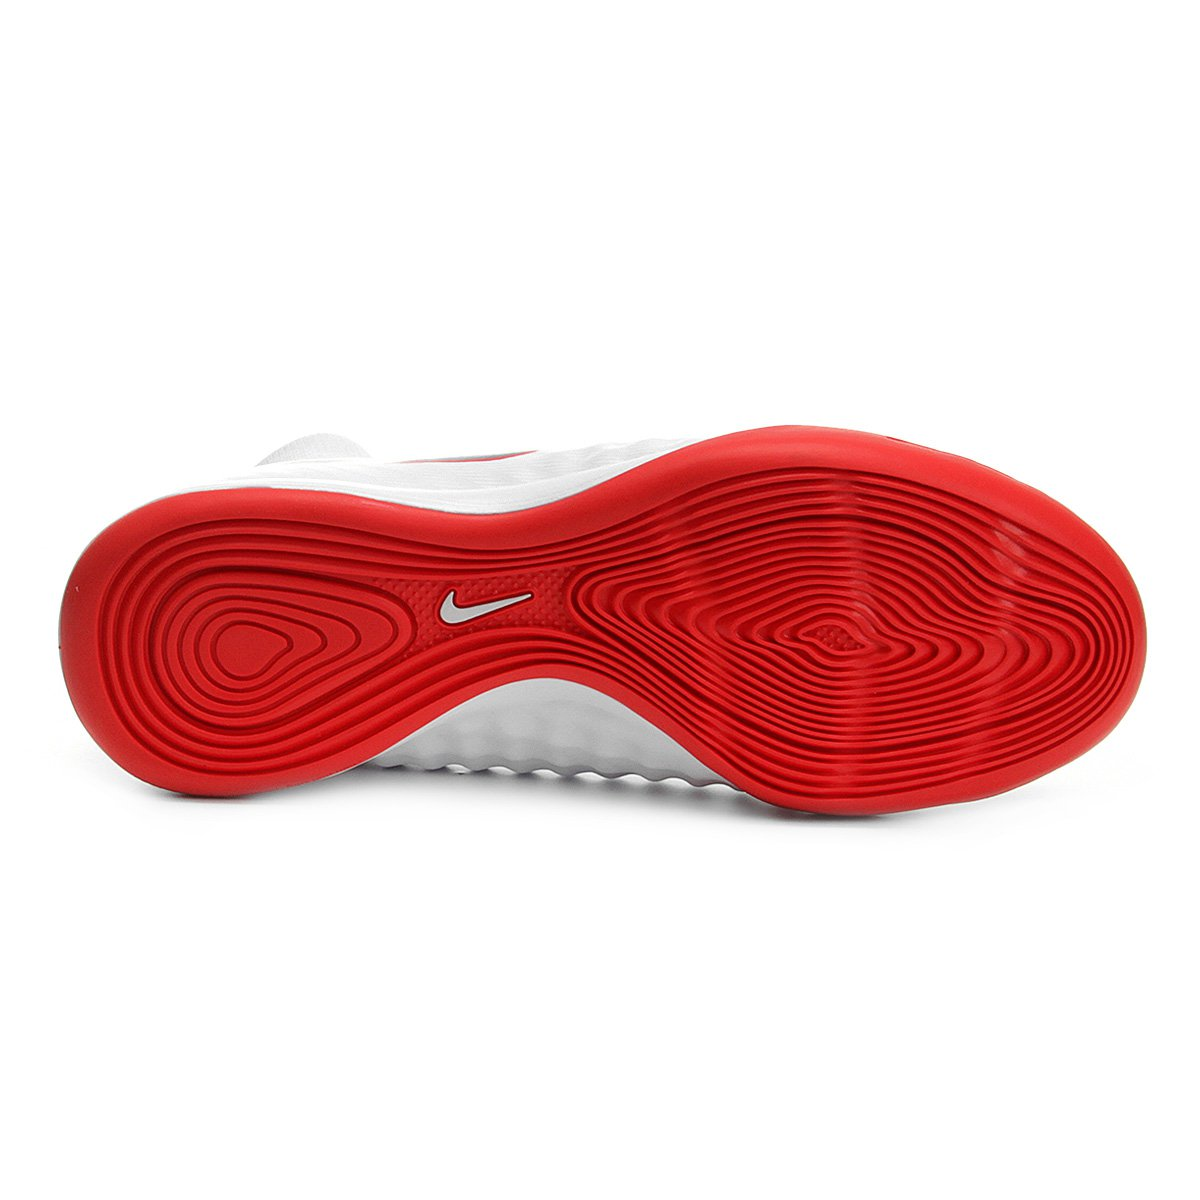 Chuteira Futsal Nike Magista Obra 2 Academy Dinamic Fit - Branco e ... d604e131740a4